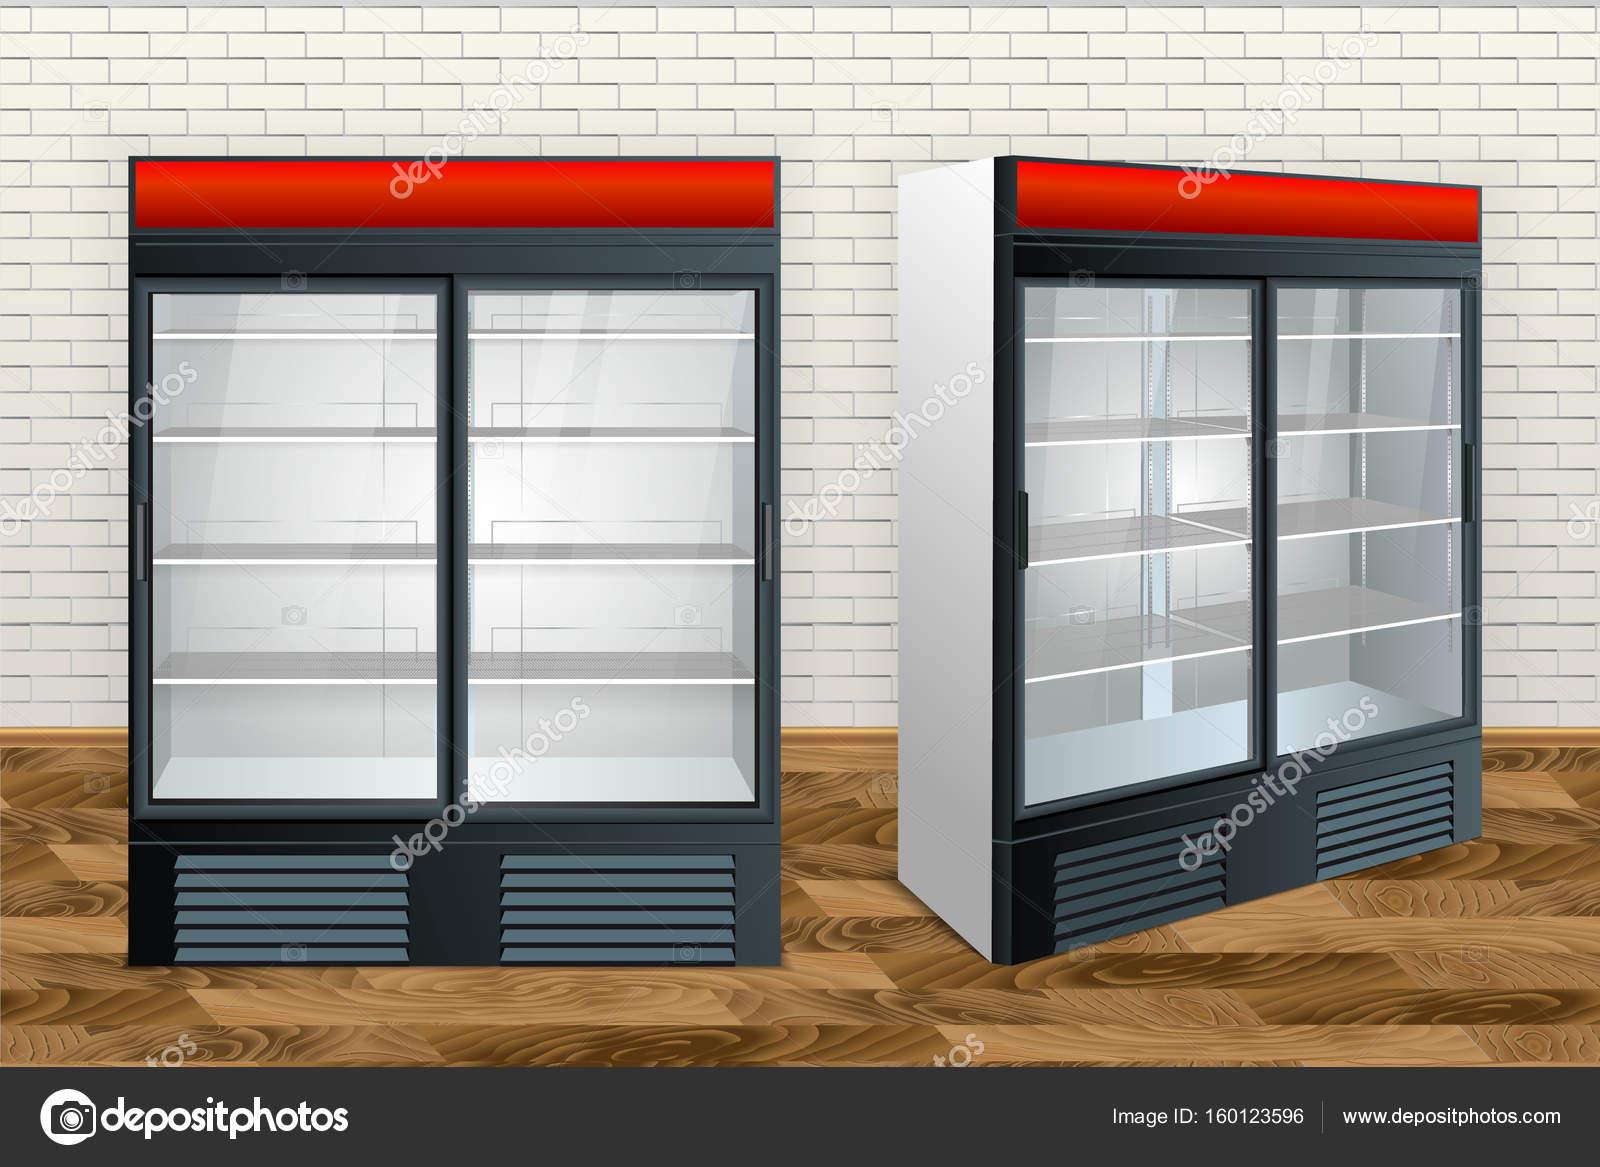 Kühlschrank Vitrine : Kühlschrank vitrine küche u stockfoto irkus life gmail